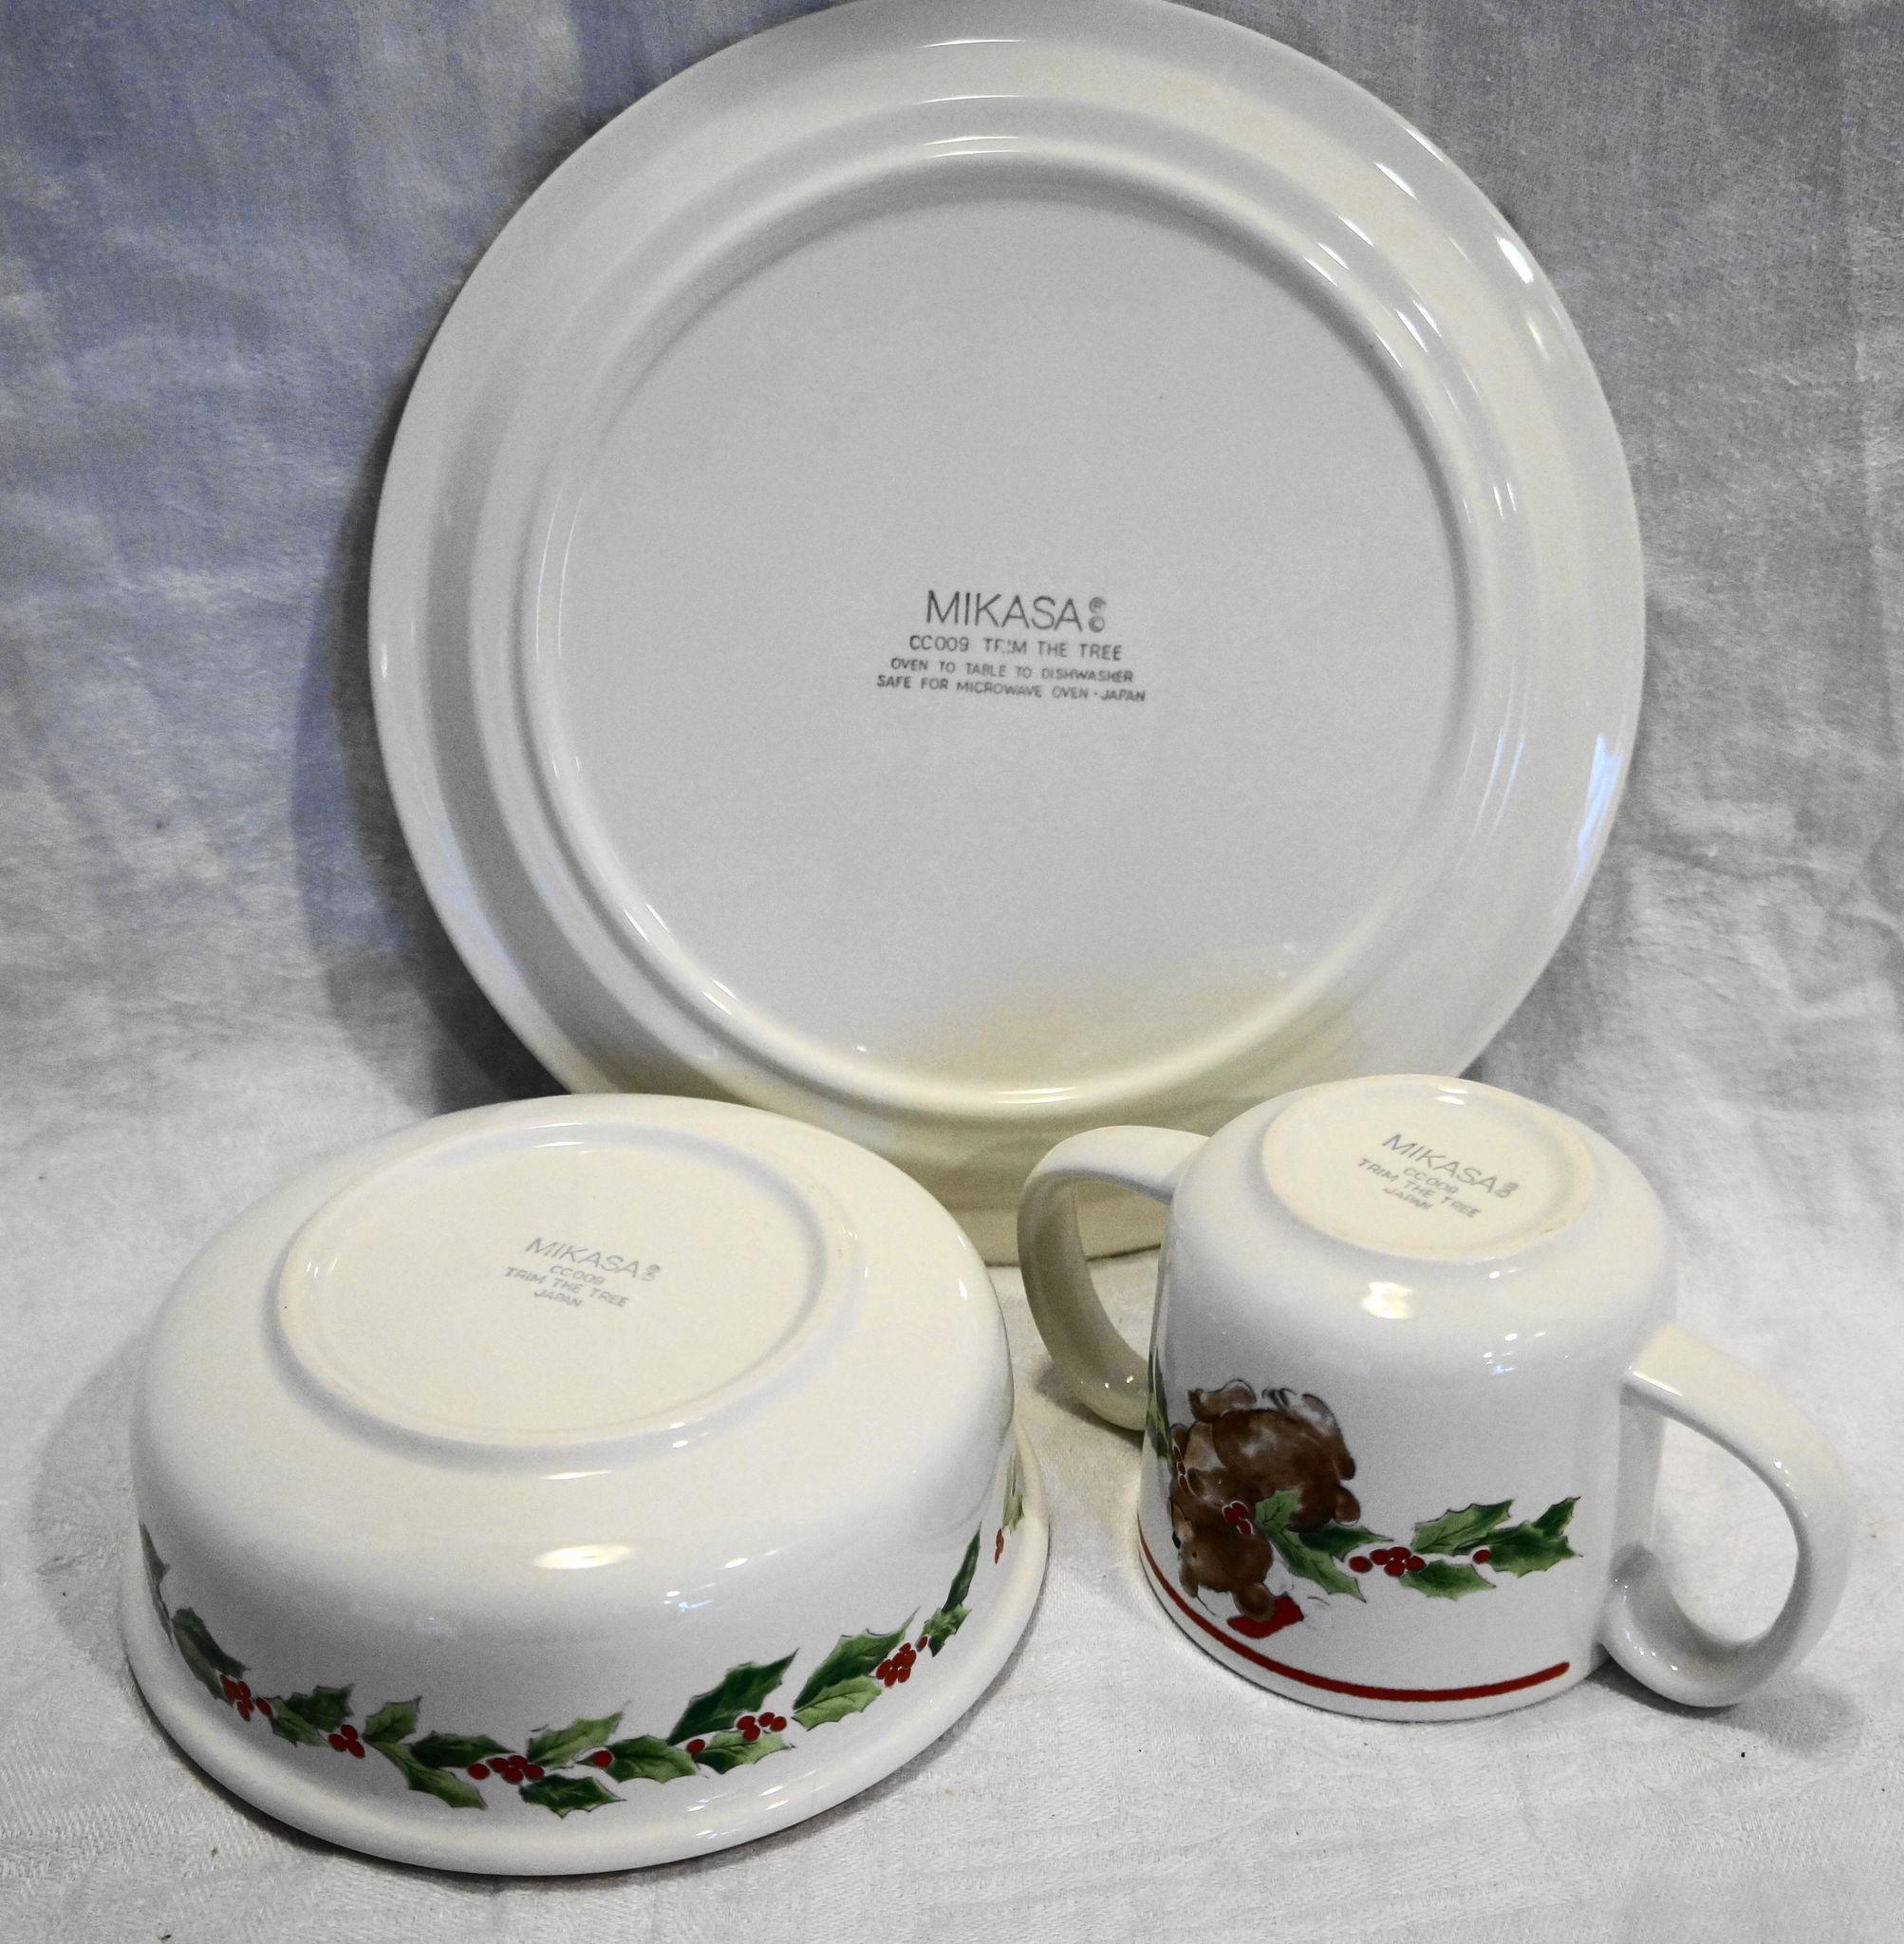 Mikasa Trim The Tree Child Dish Set Plate Bowl Mug